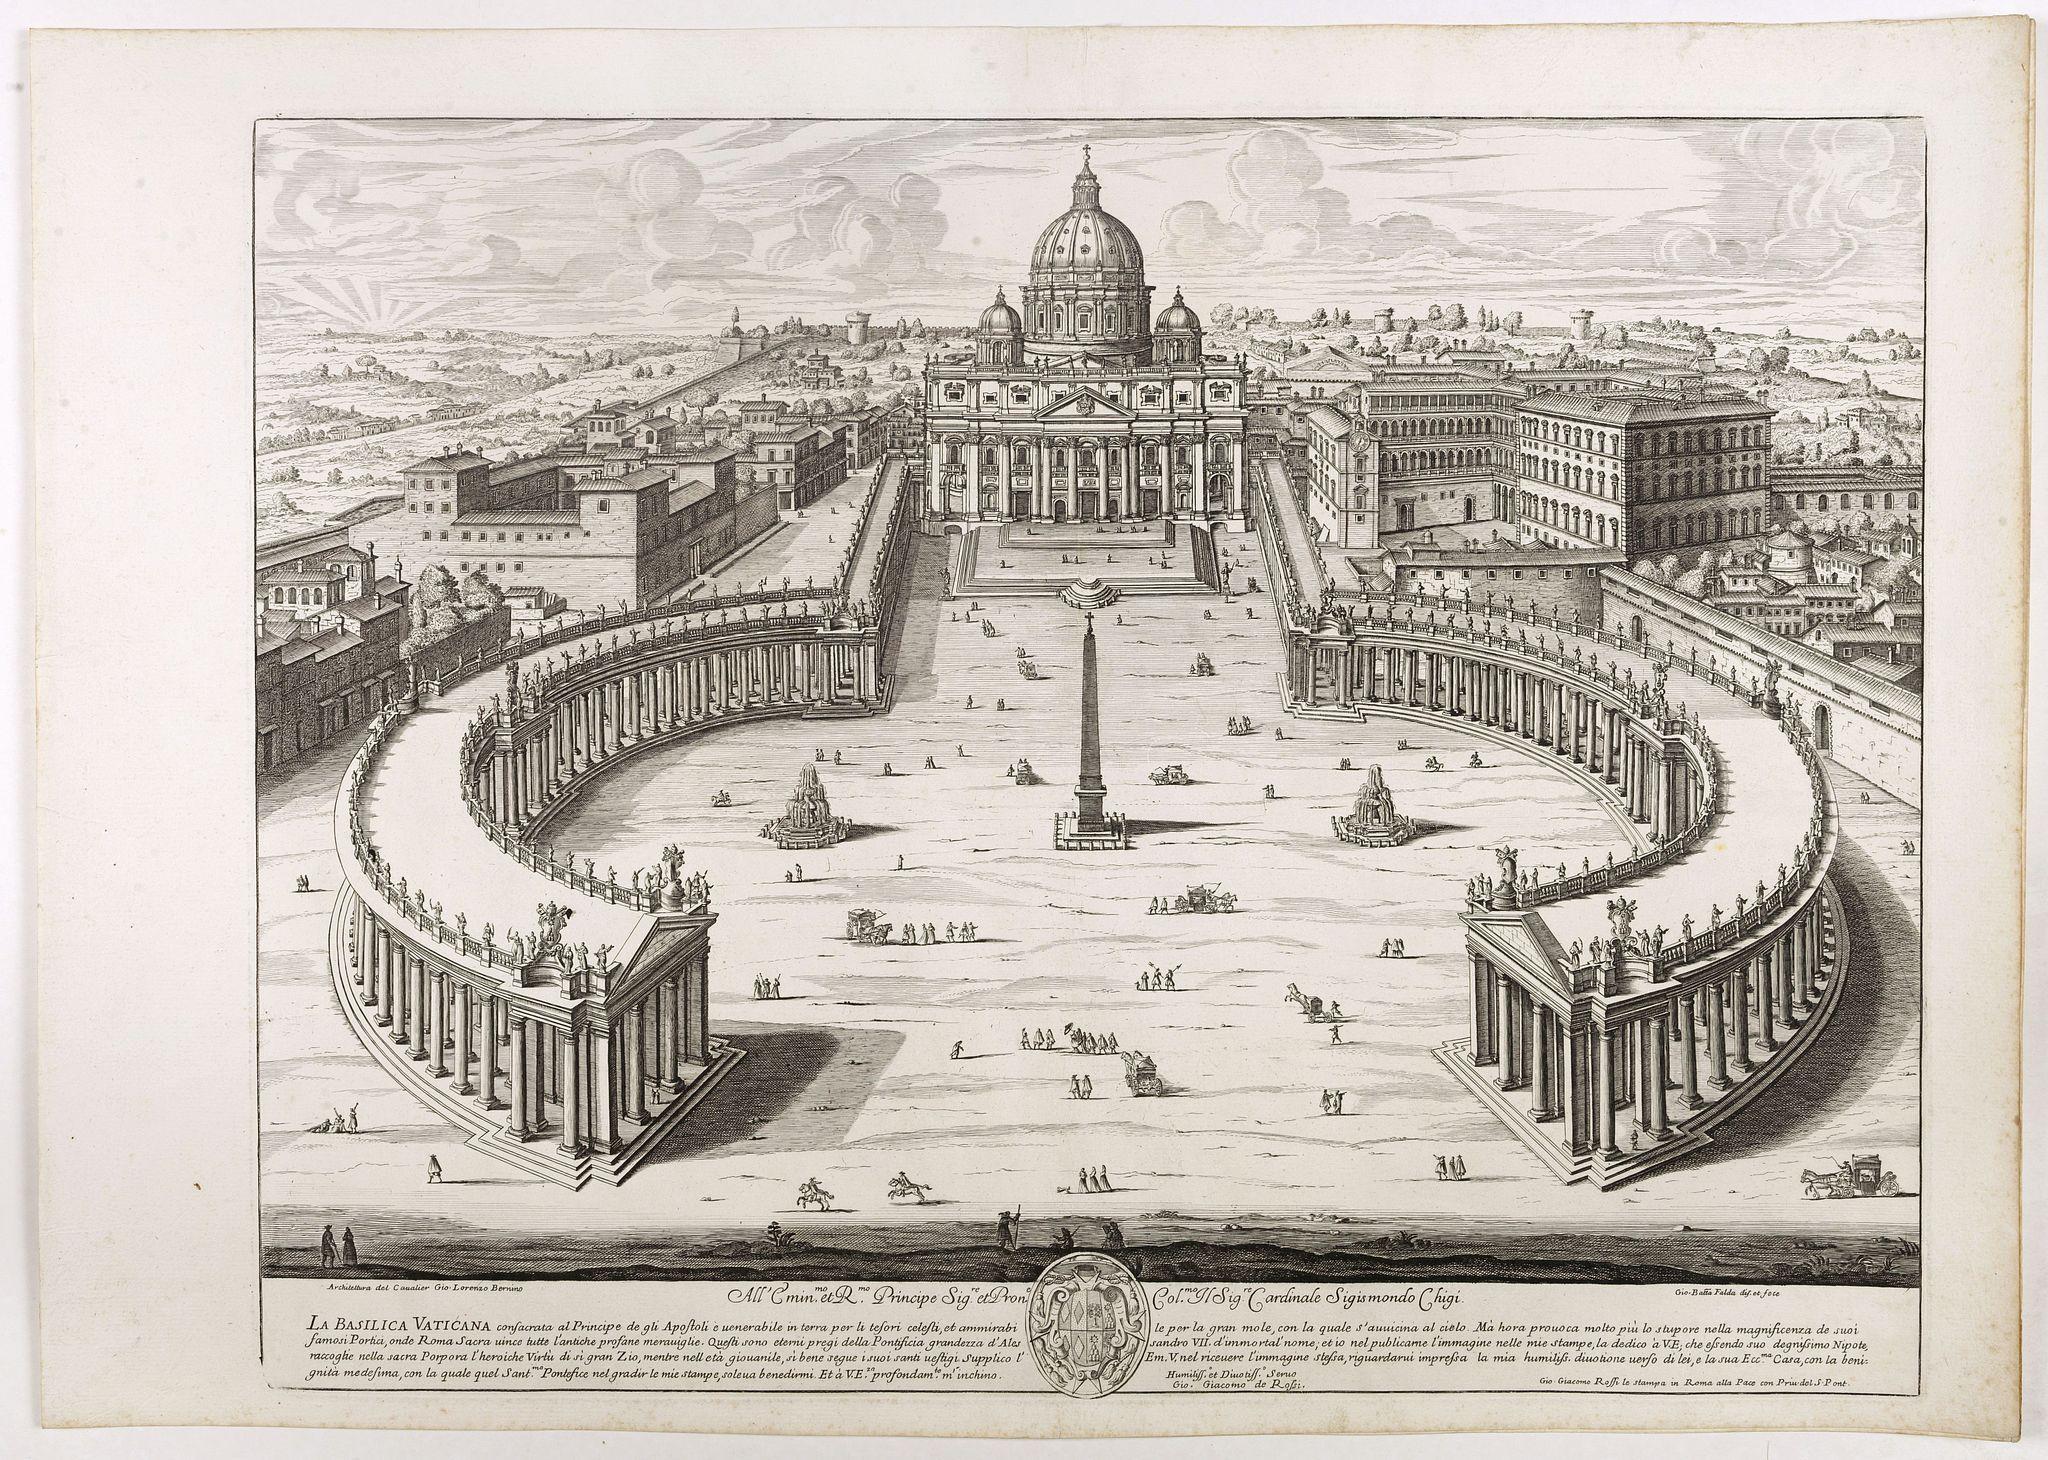 DE ROSSI, G. -  La Basilica Vaticana consacrata al Principe de gli Apostoli . . .